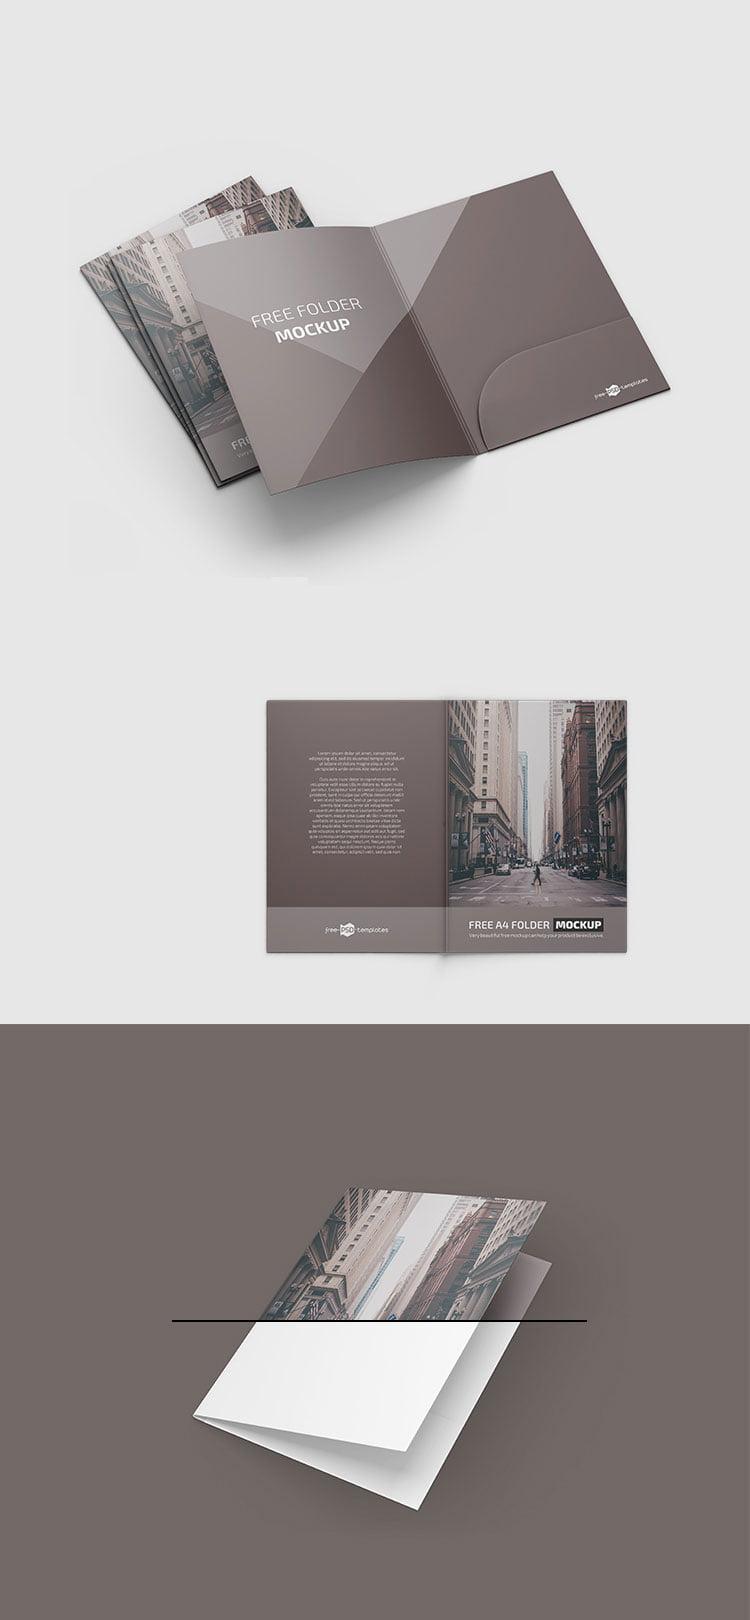 Download Free A4 Folder Mockup | Mockuptree